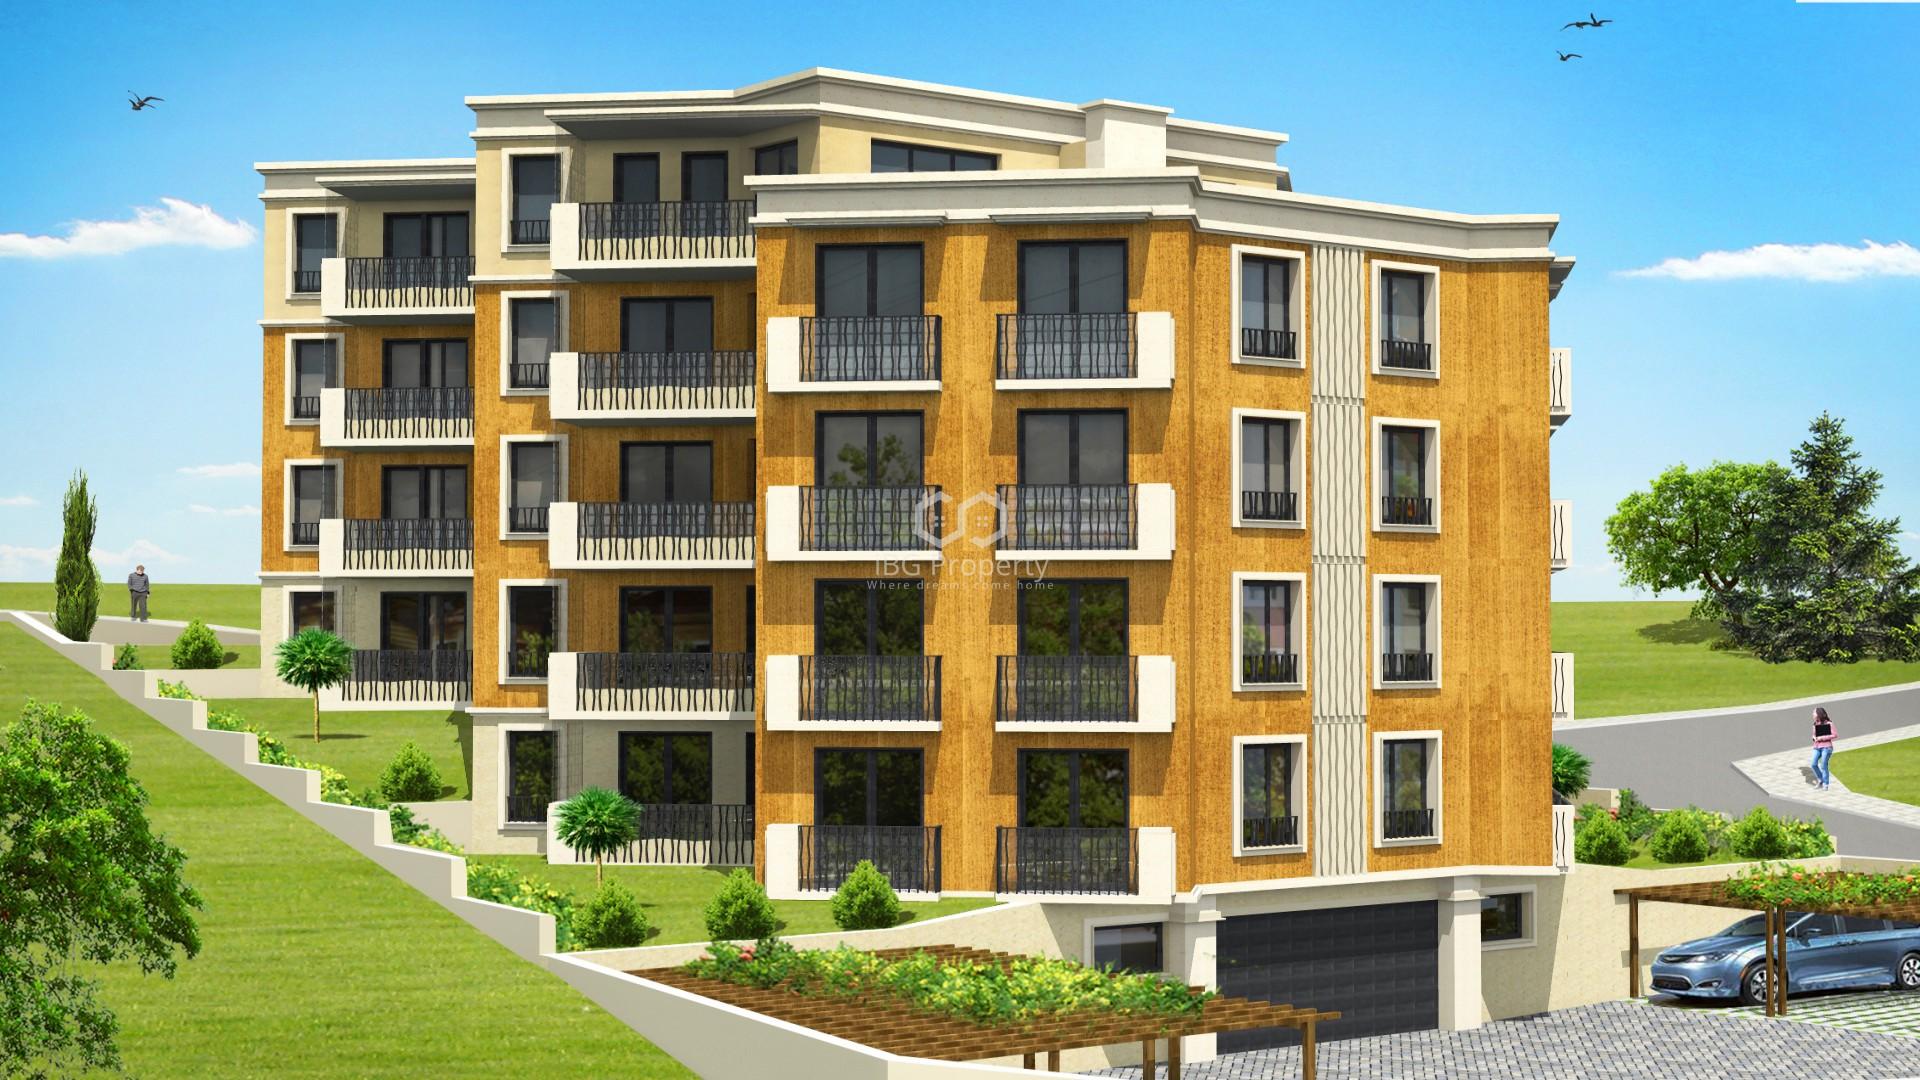 Two bedroom apartment briz Varna 107 m2